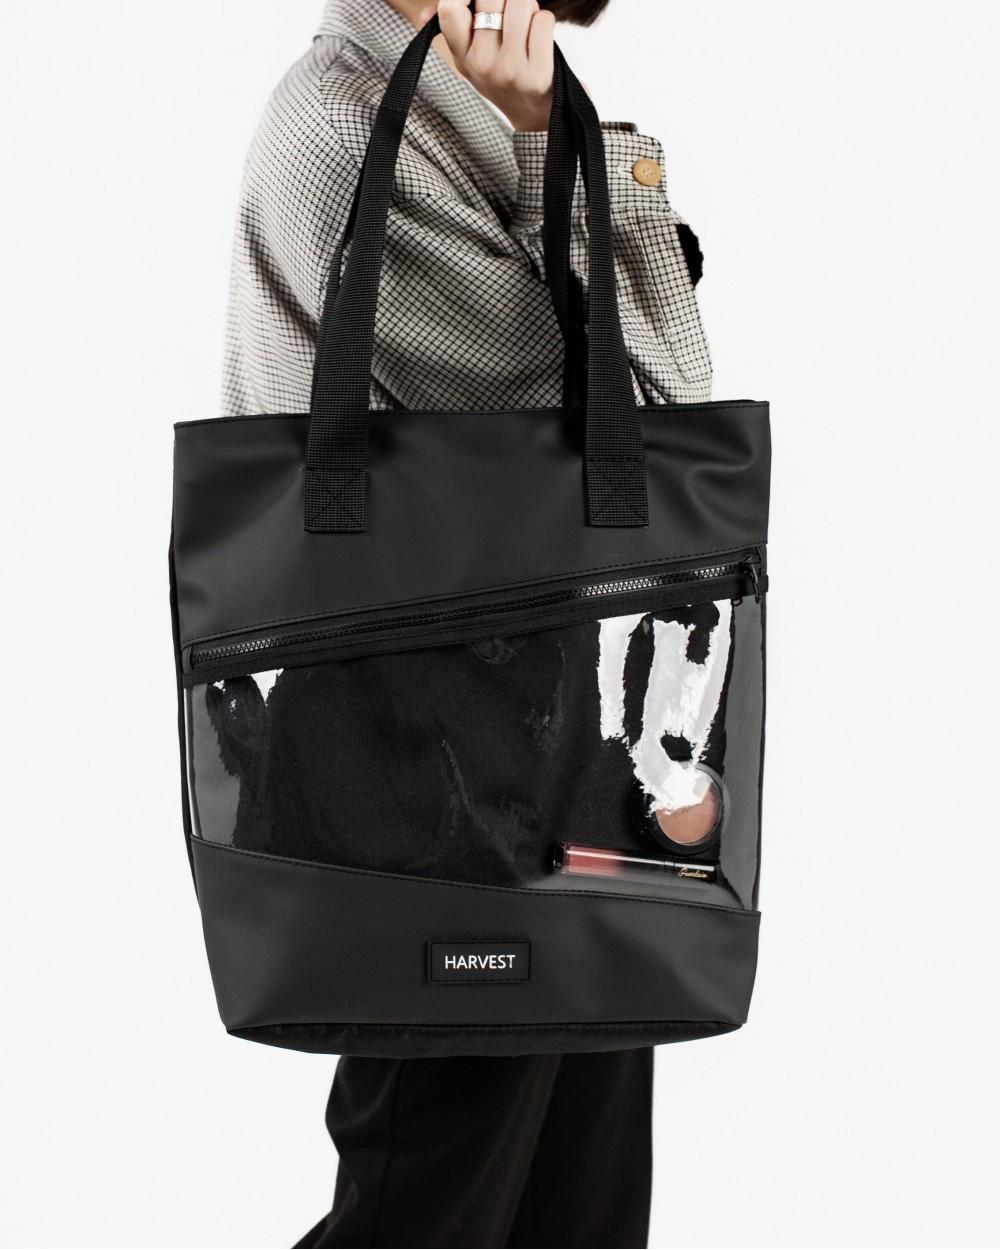 Сумка жіноча HARVEST шопер training bag medium глянцева чорна 32x38x14 см. екошкіра